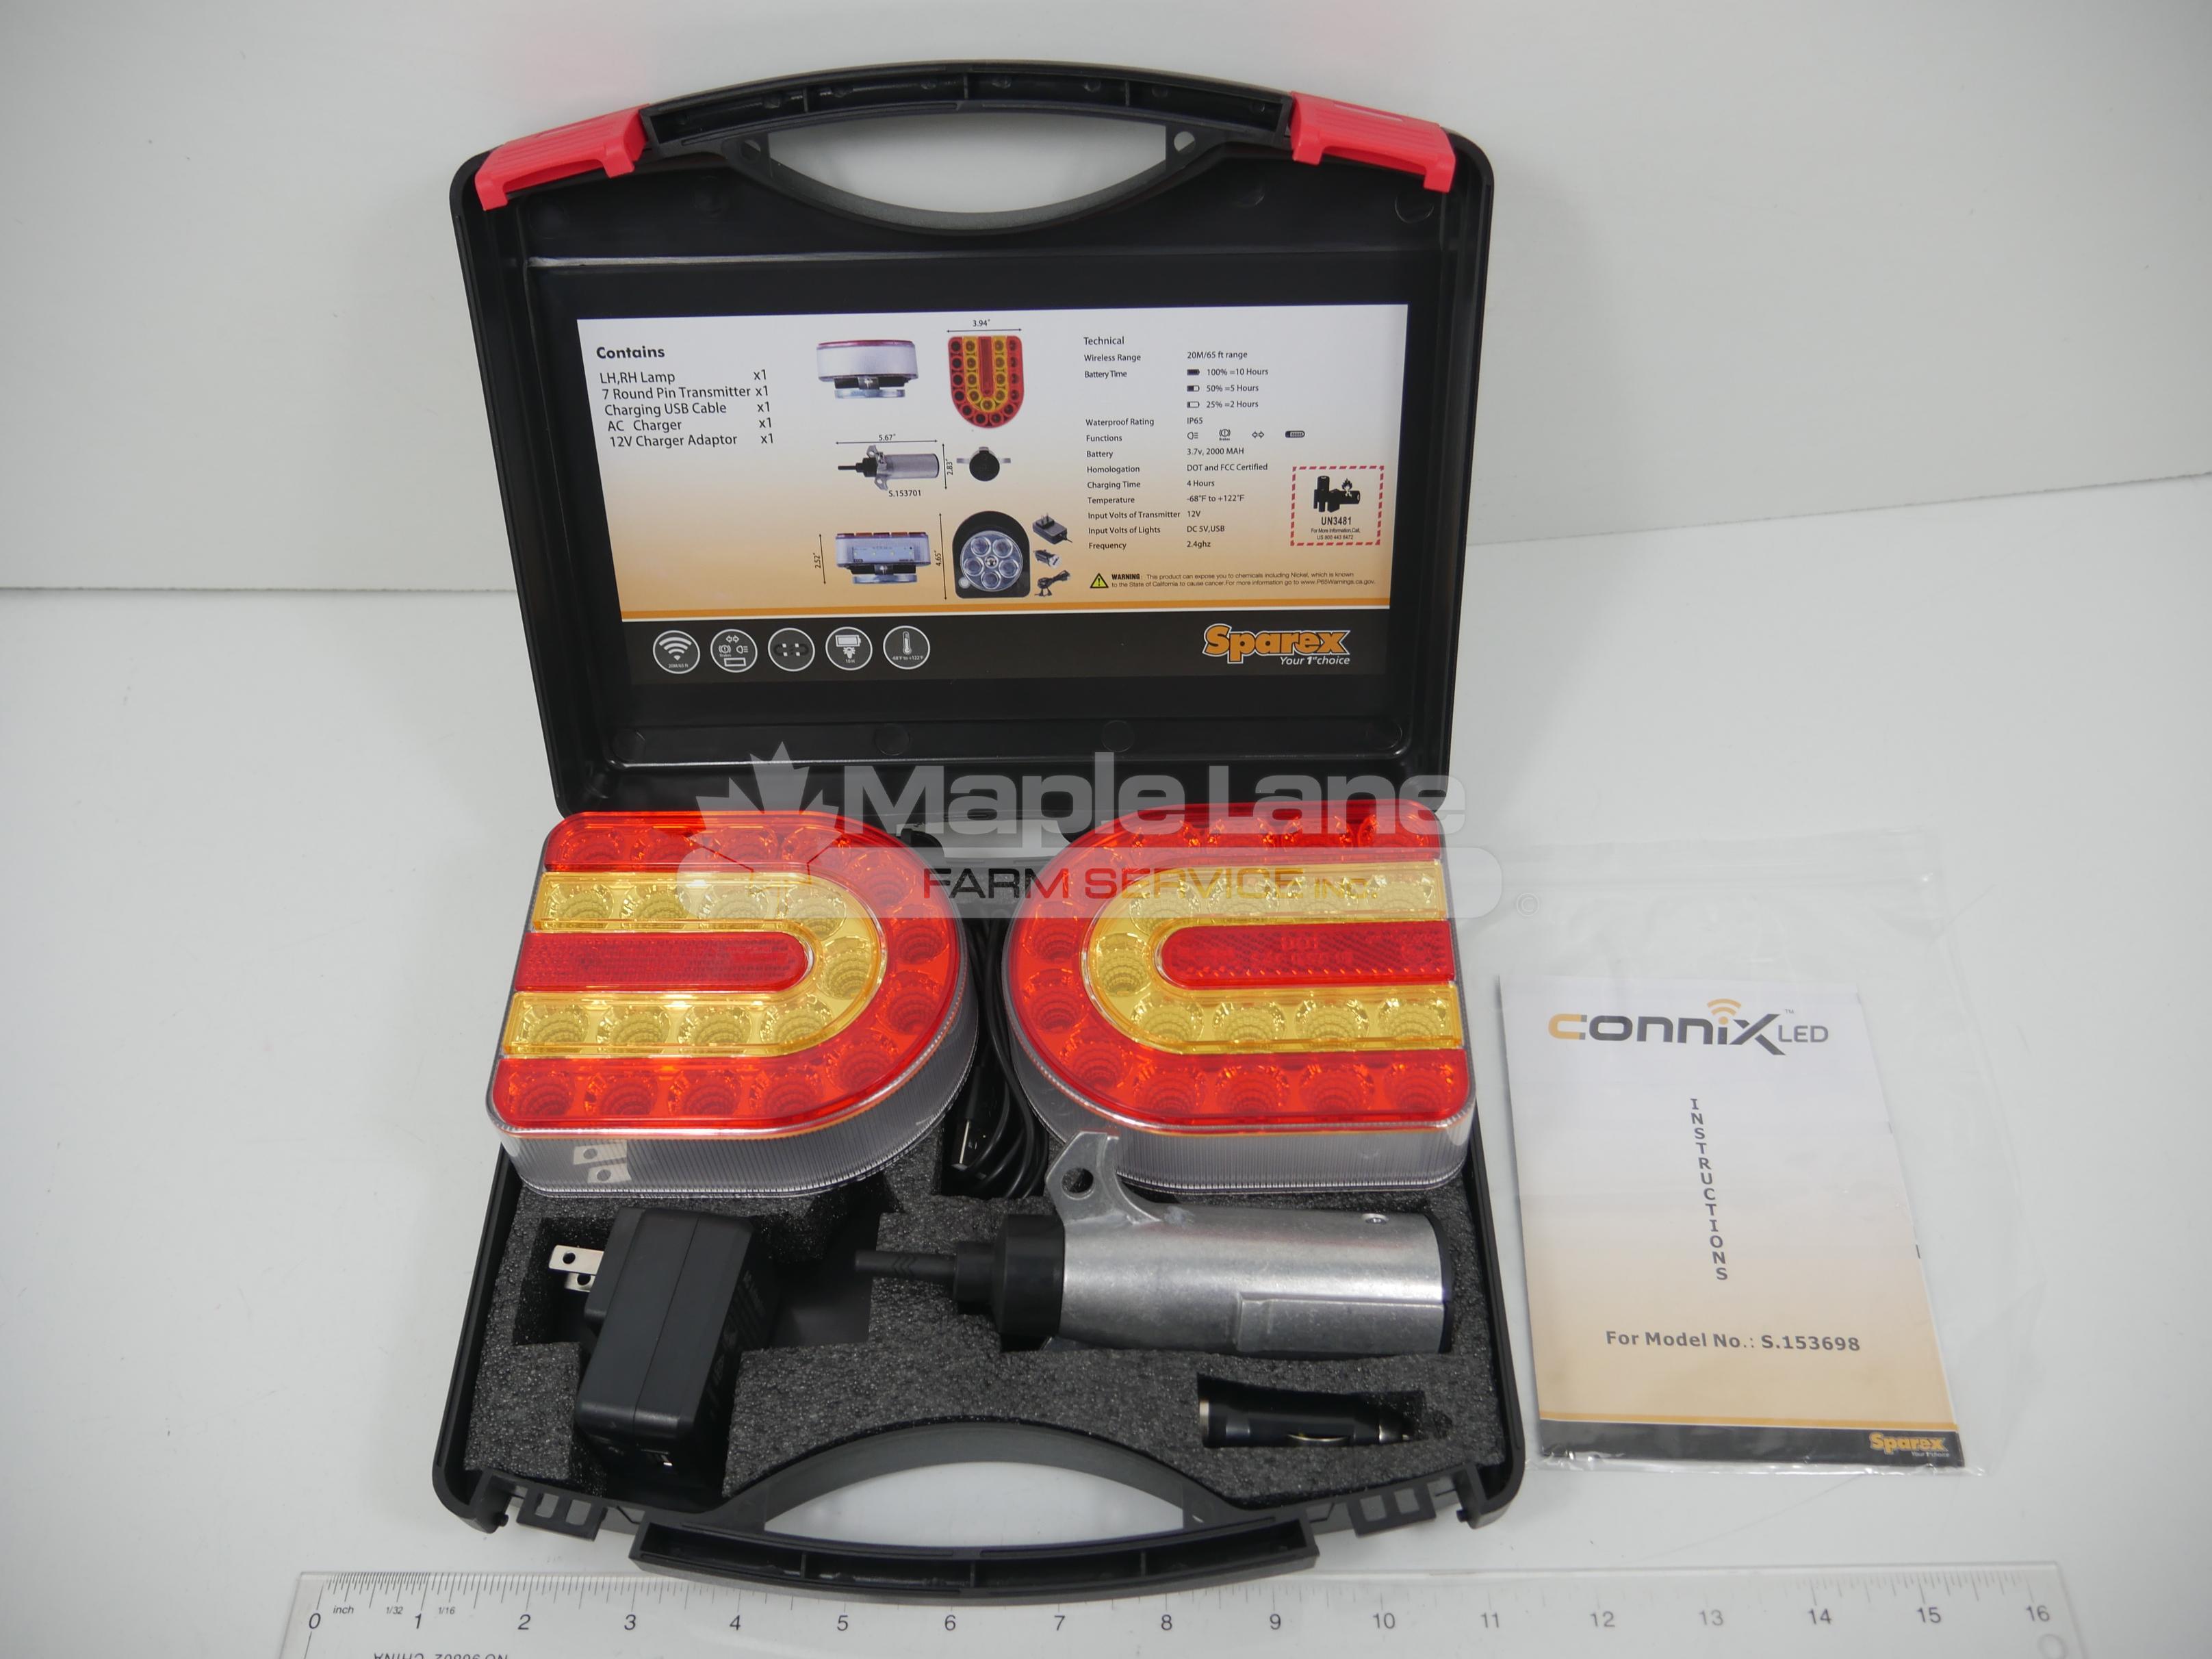 153698 Wireless Tail Light Kit